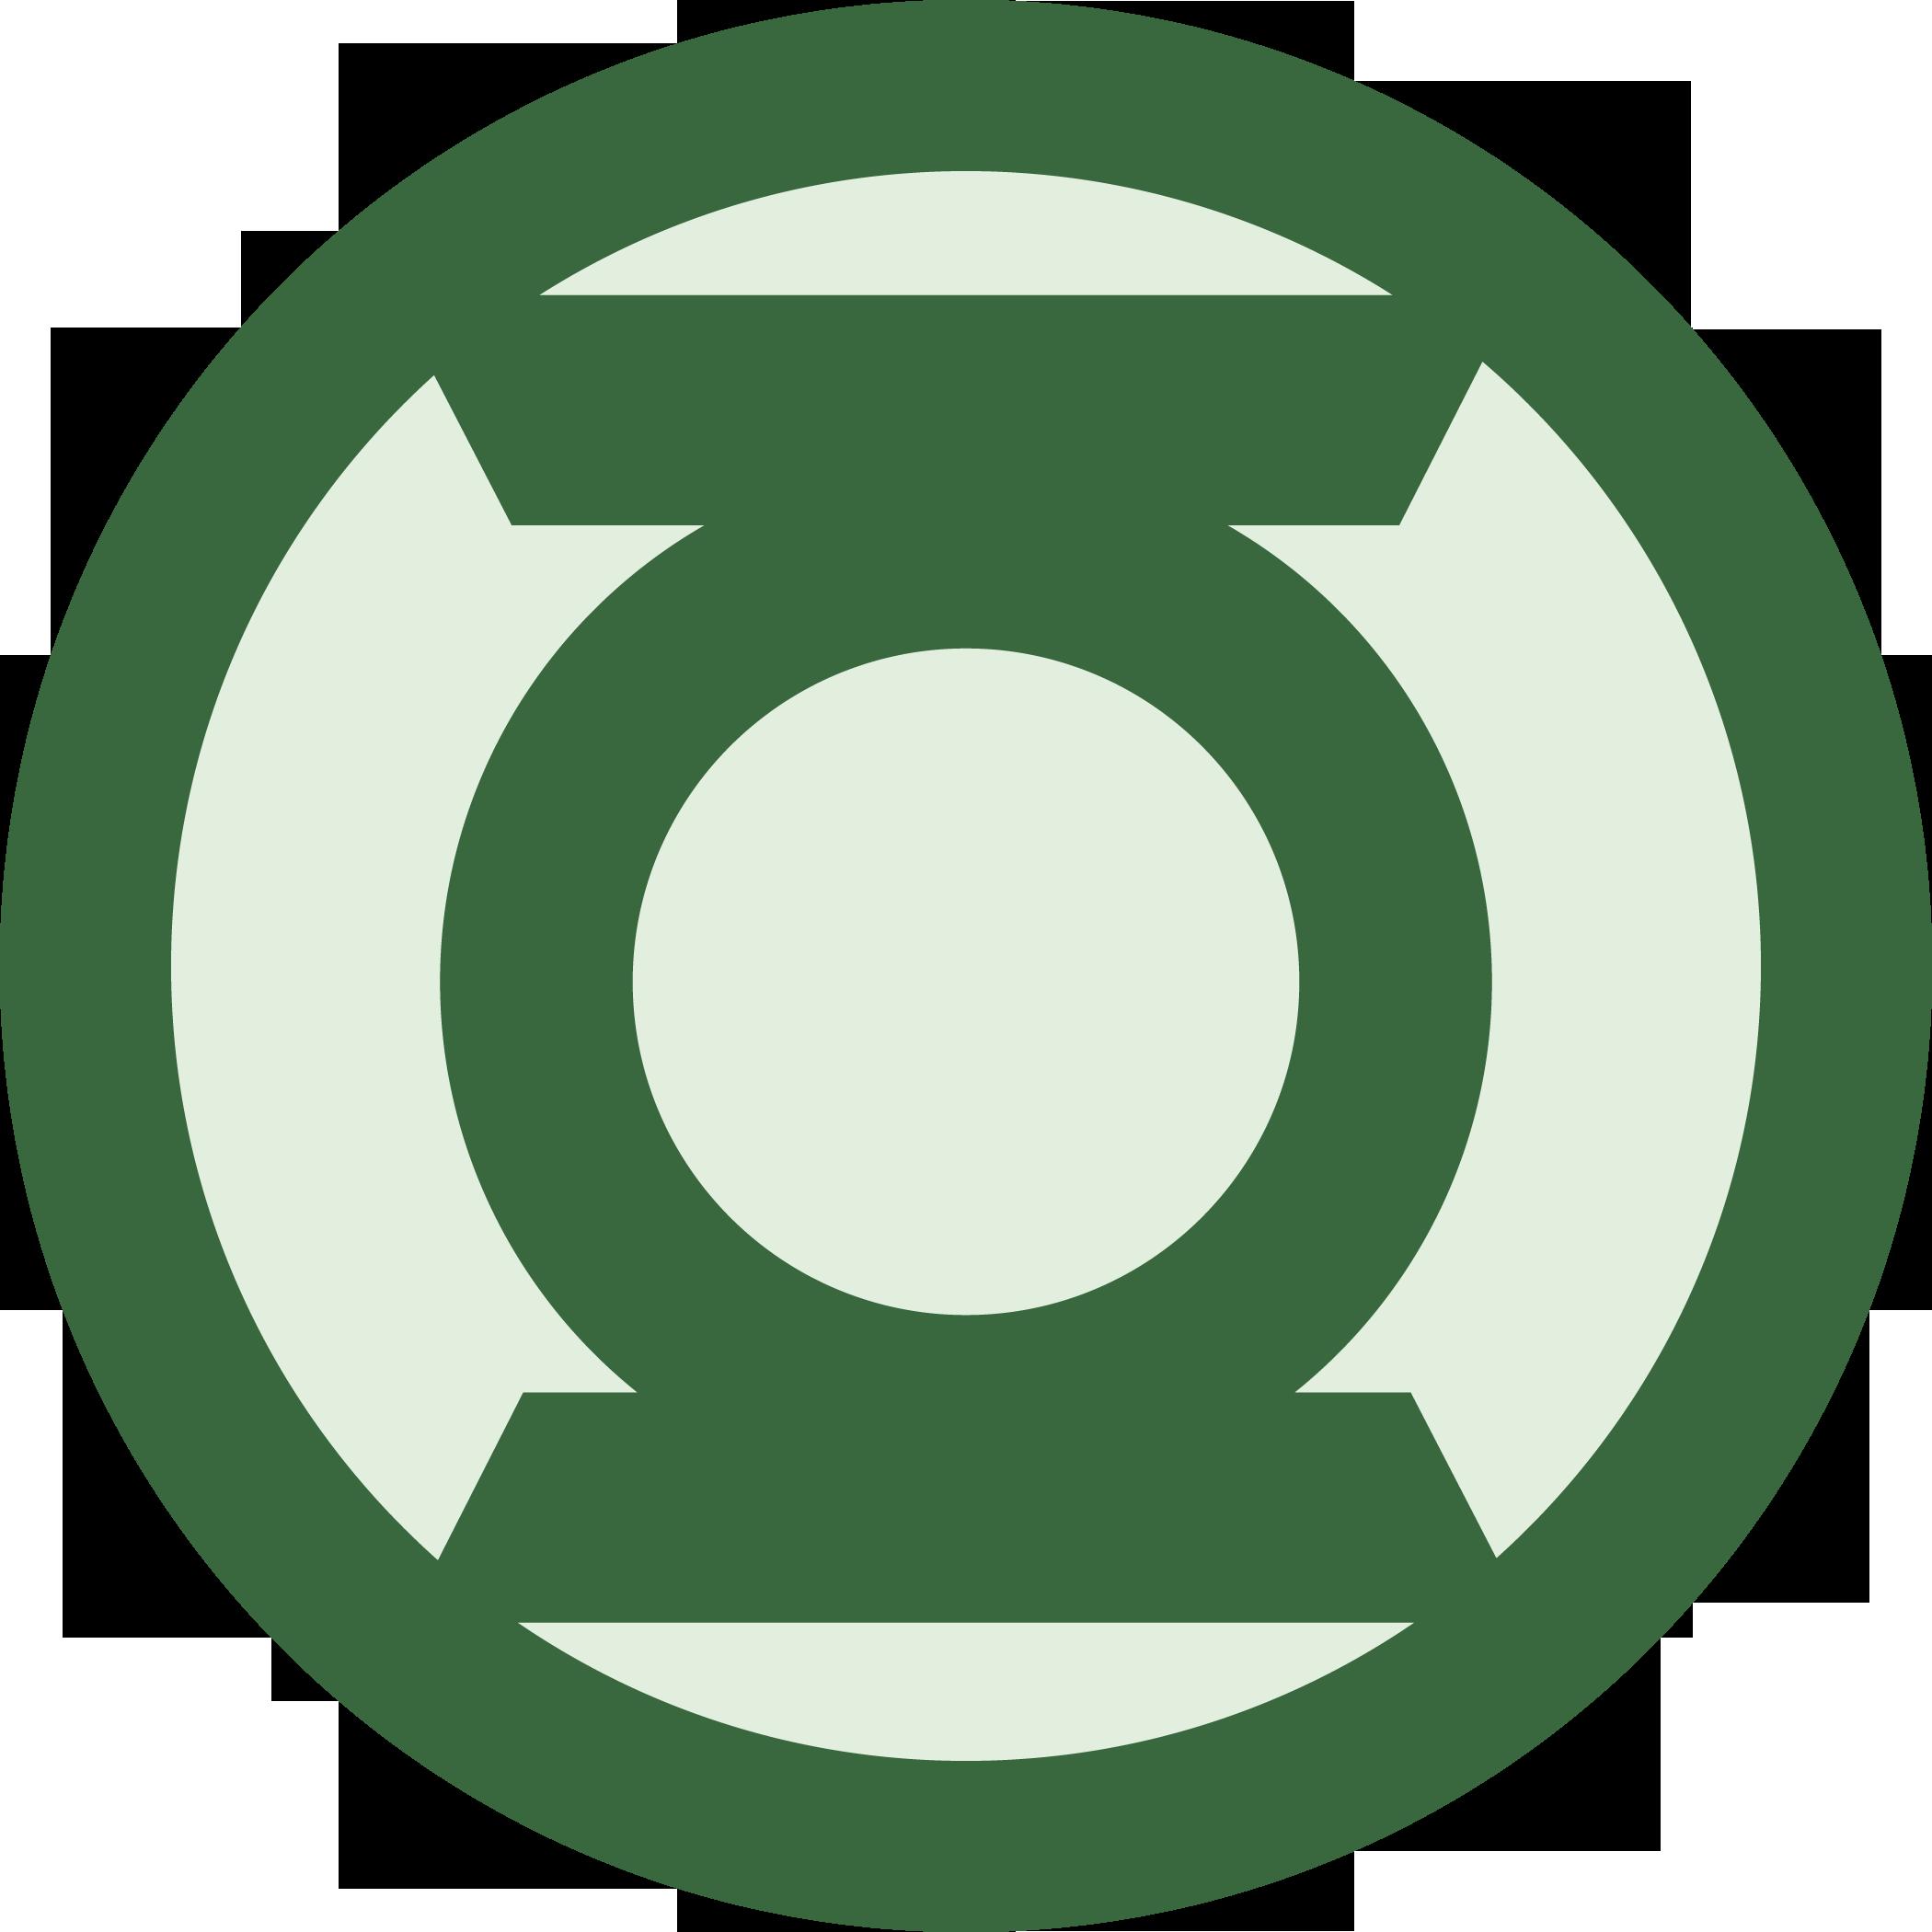 Mask clipart green lantern. Greenlantern corps pinterest superman